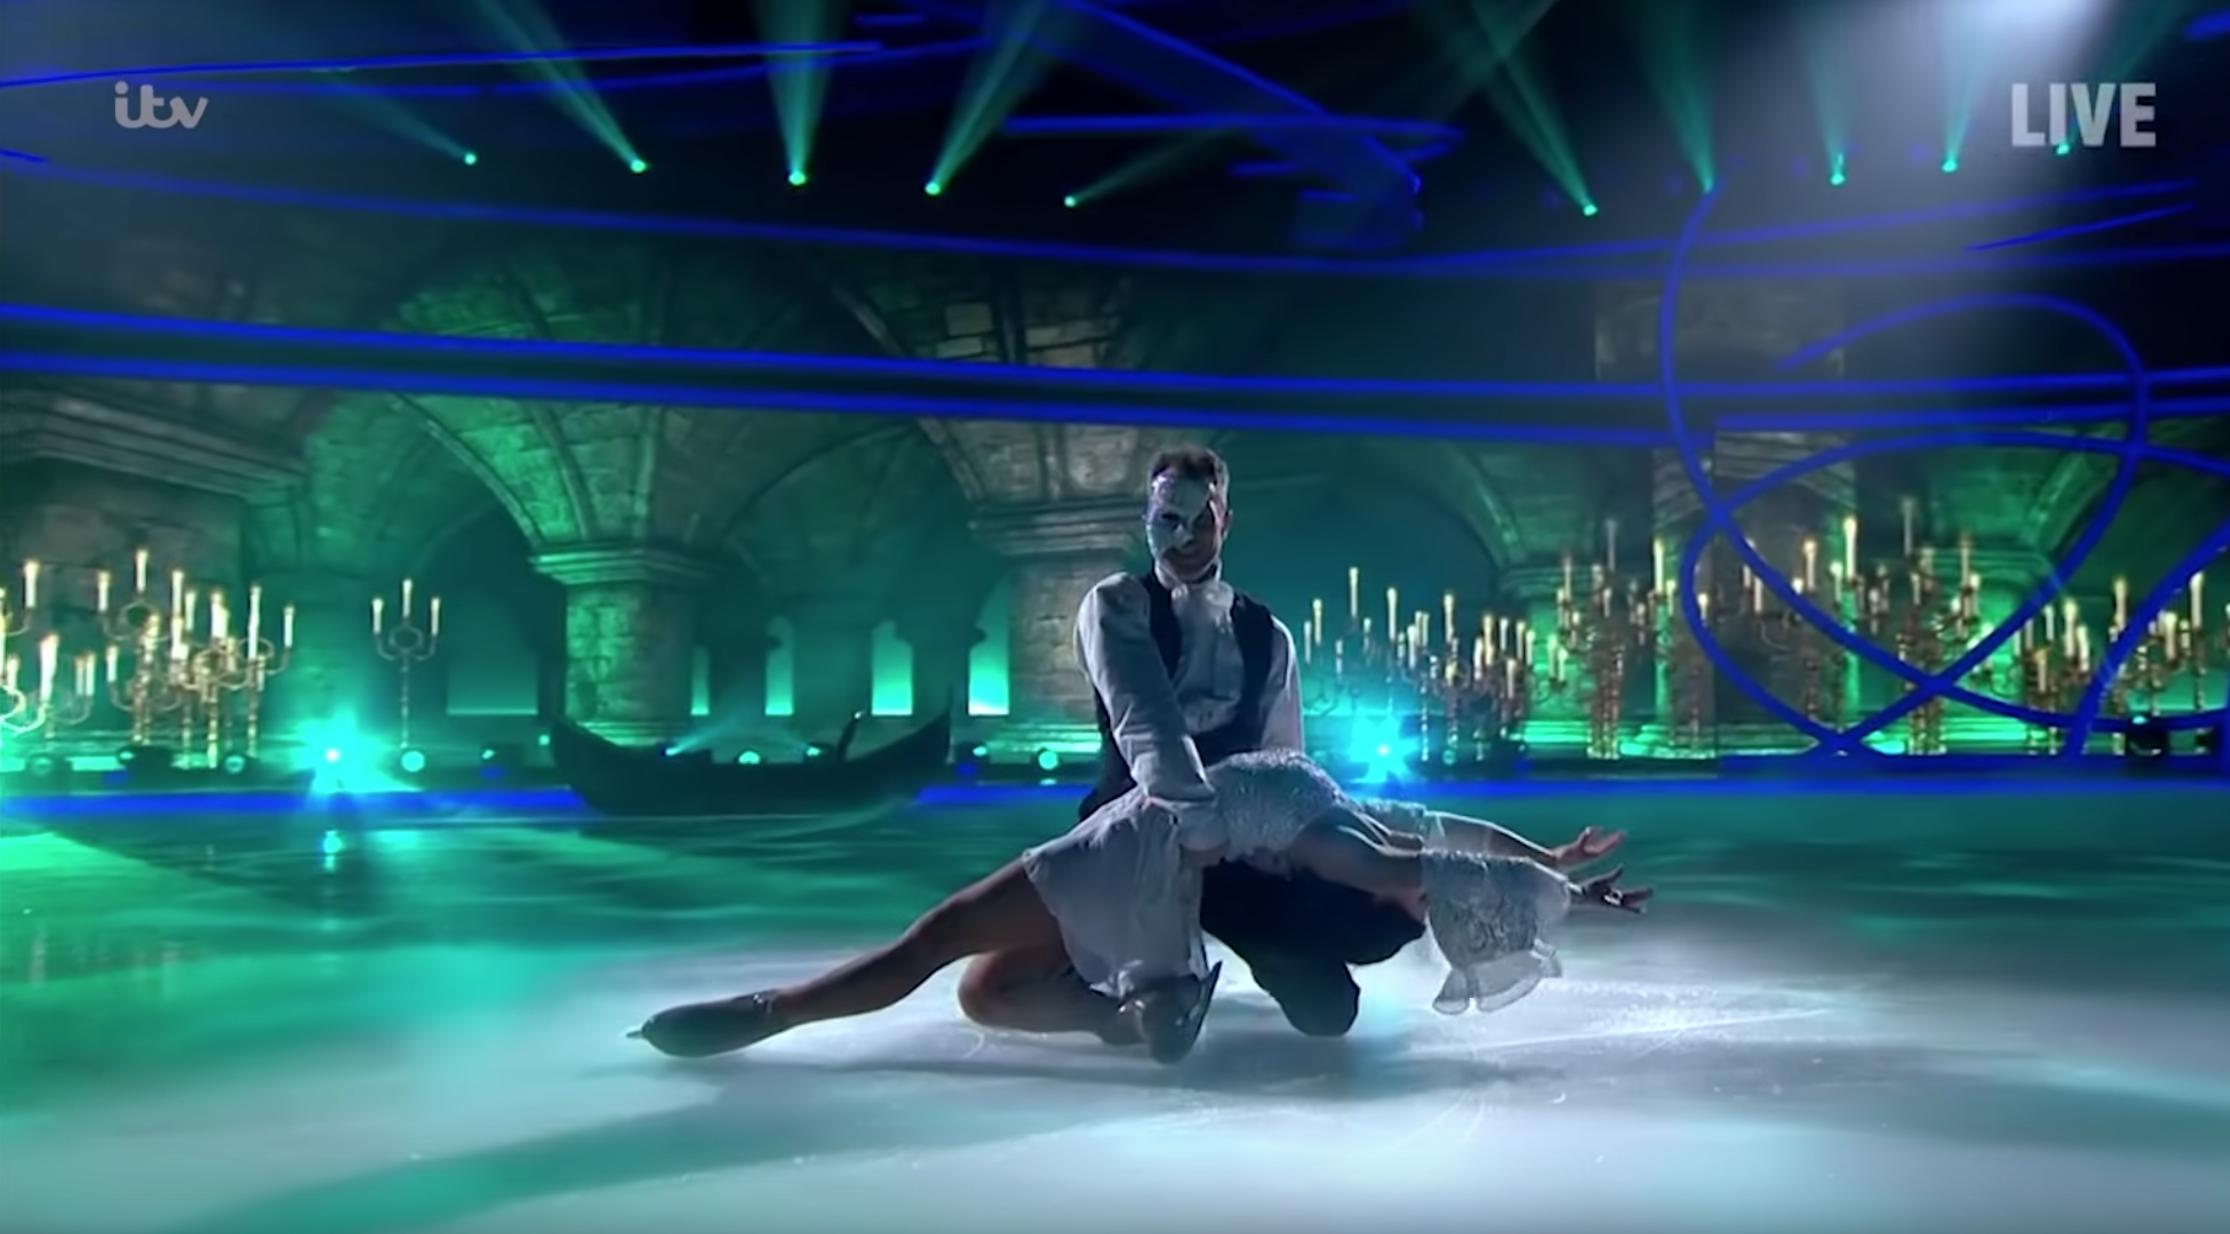 James Jordan Dancing on Ice ITV